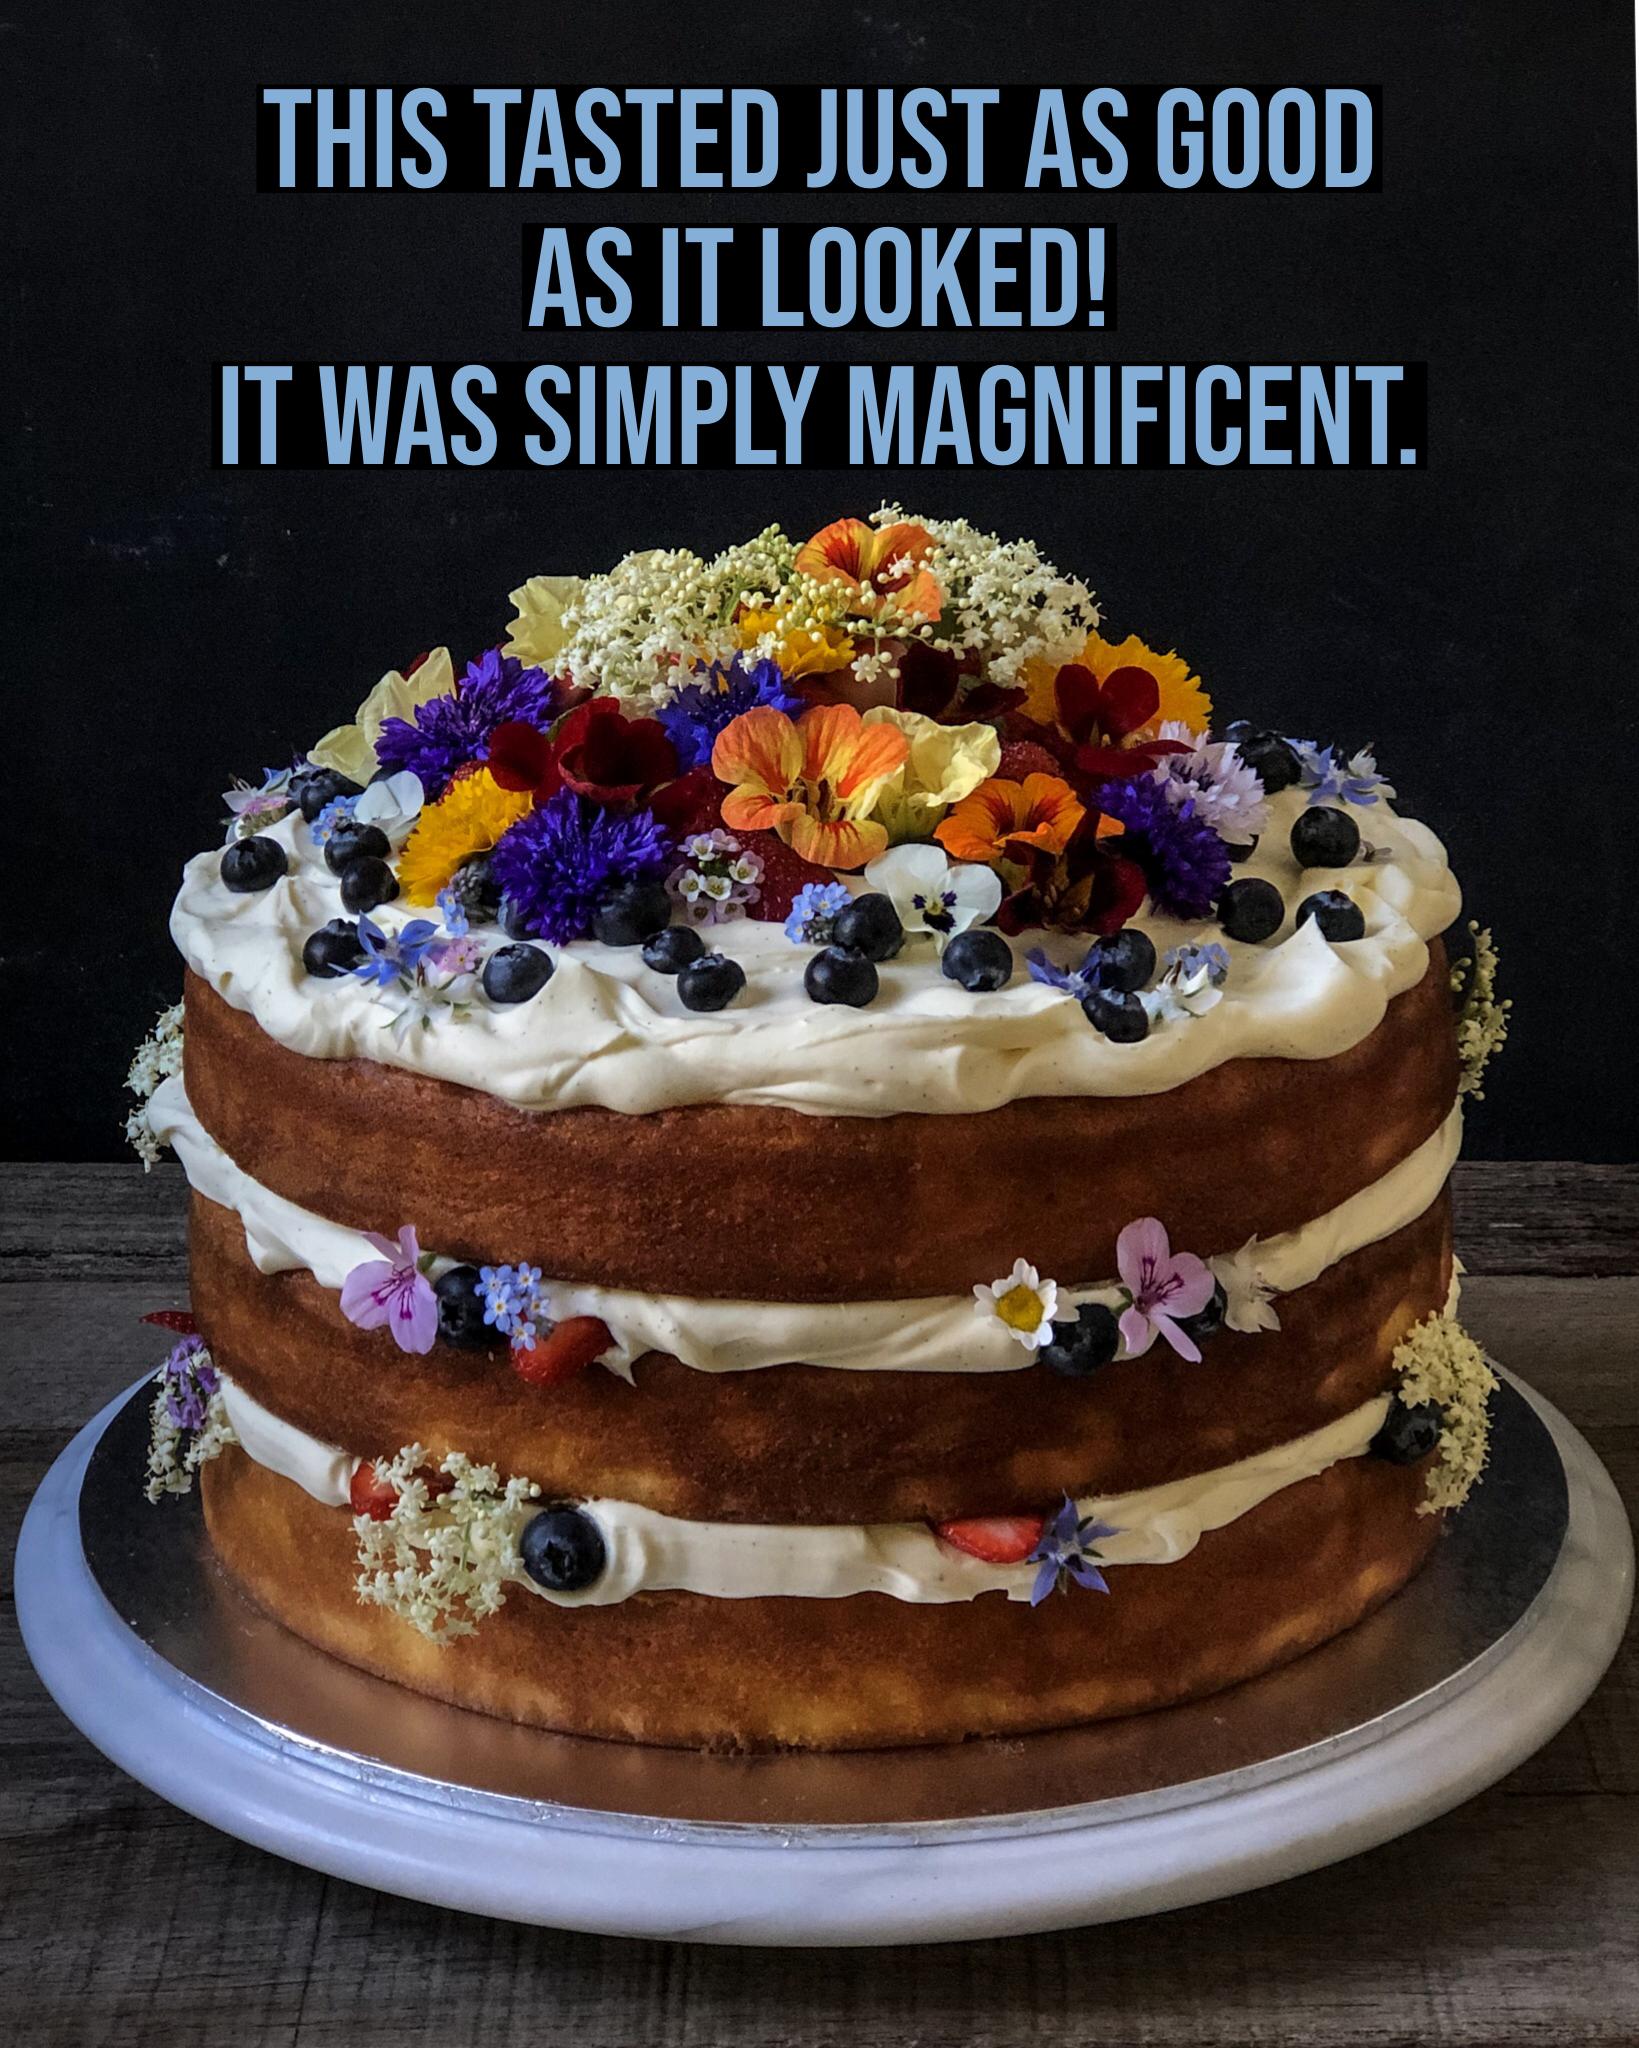 Sydney Cakes, Baked By Fiona 12 inch vanilla mascarpone cake